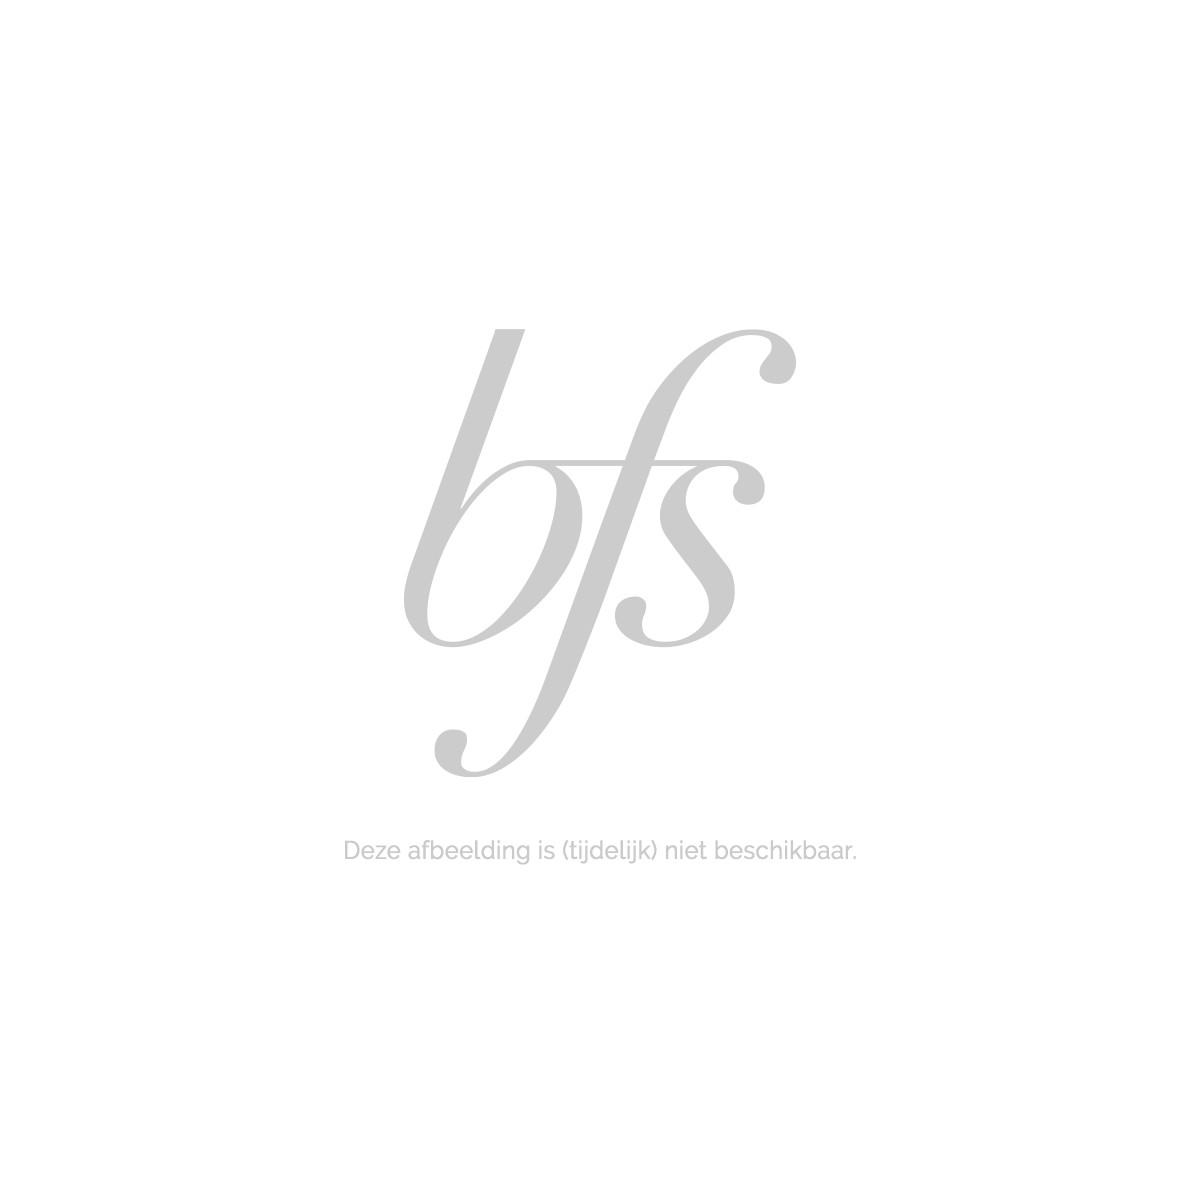 Hildegard Braukmann Winter Season Lippen Balsam LSF 30 Hoher Schutz UVB + UVA